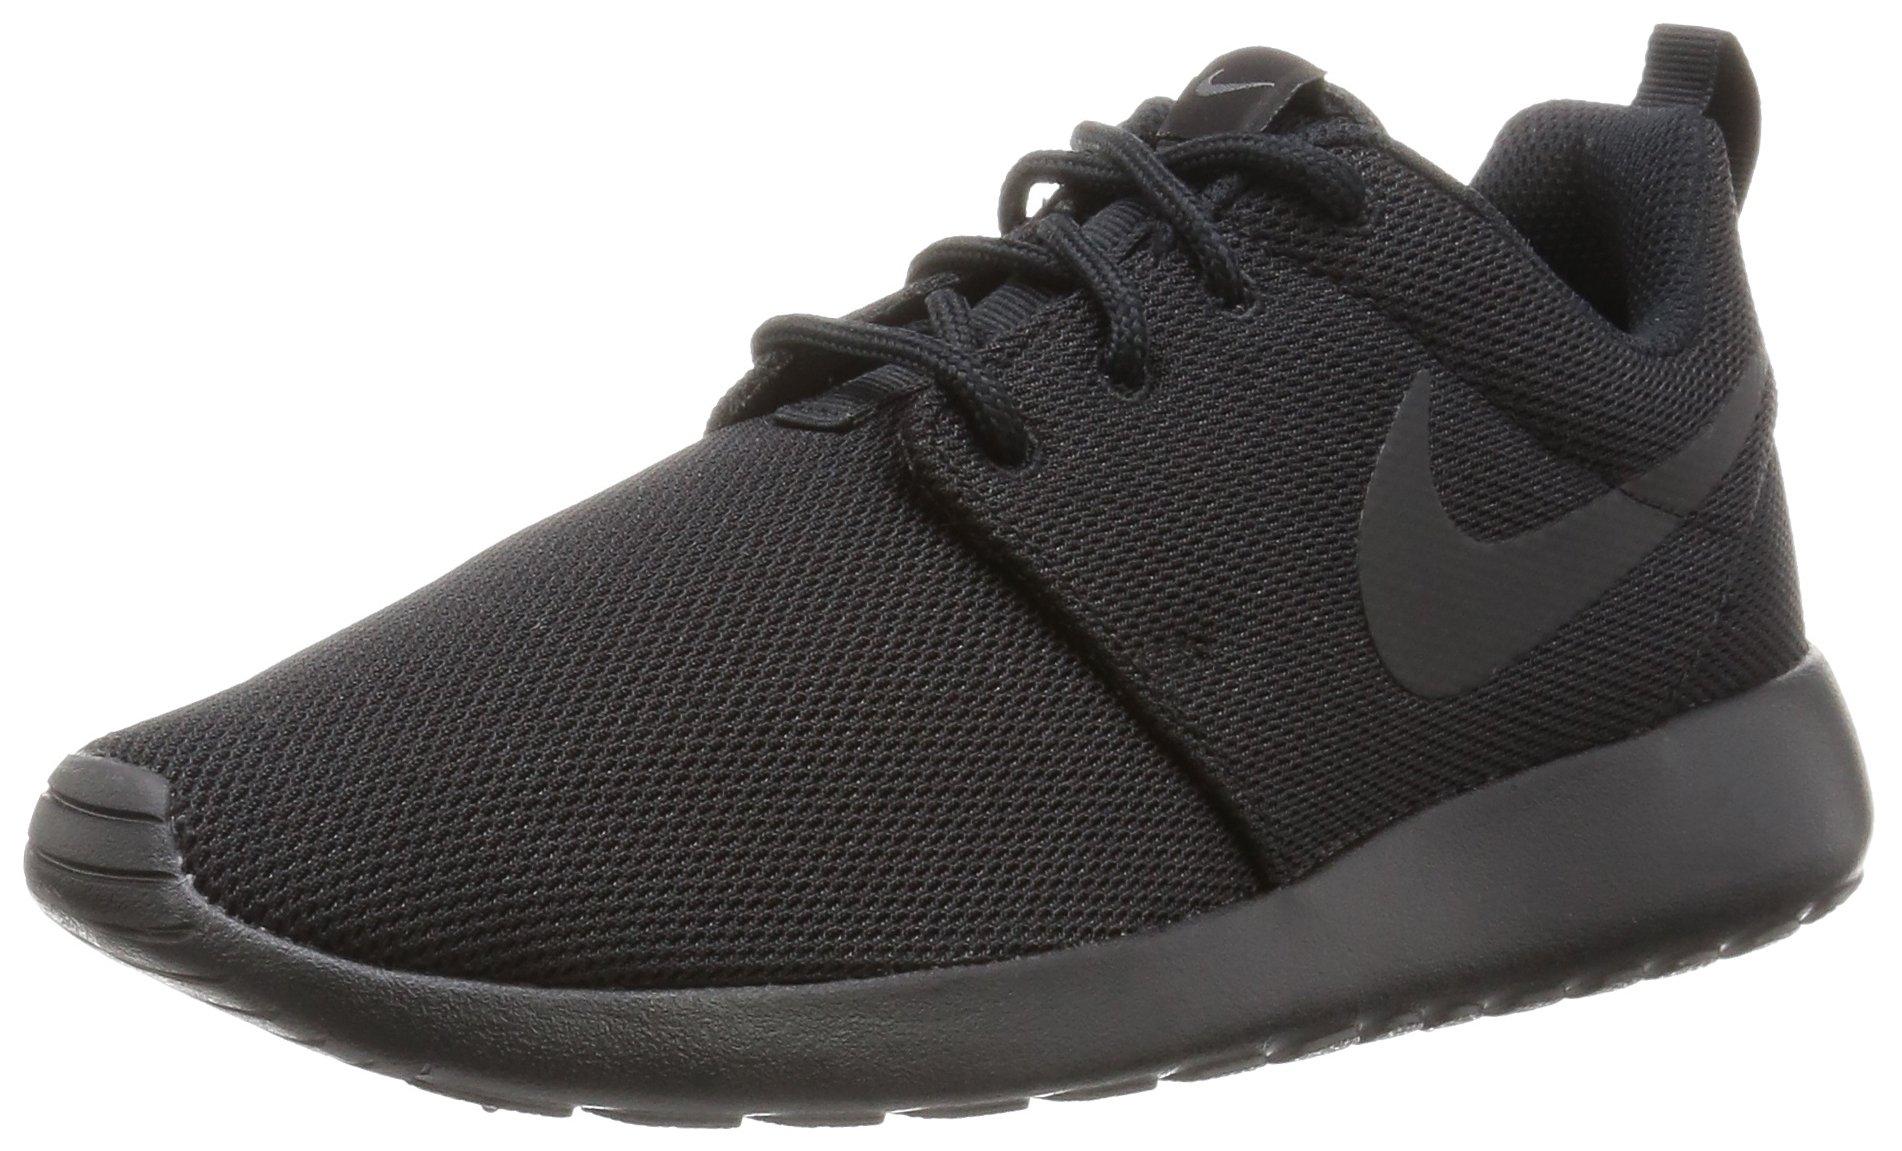 Nike Womens Roshe One running shoe Black/Black/Dark Grey 7.5